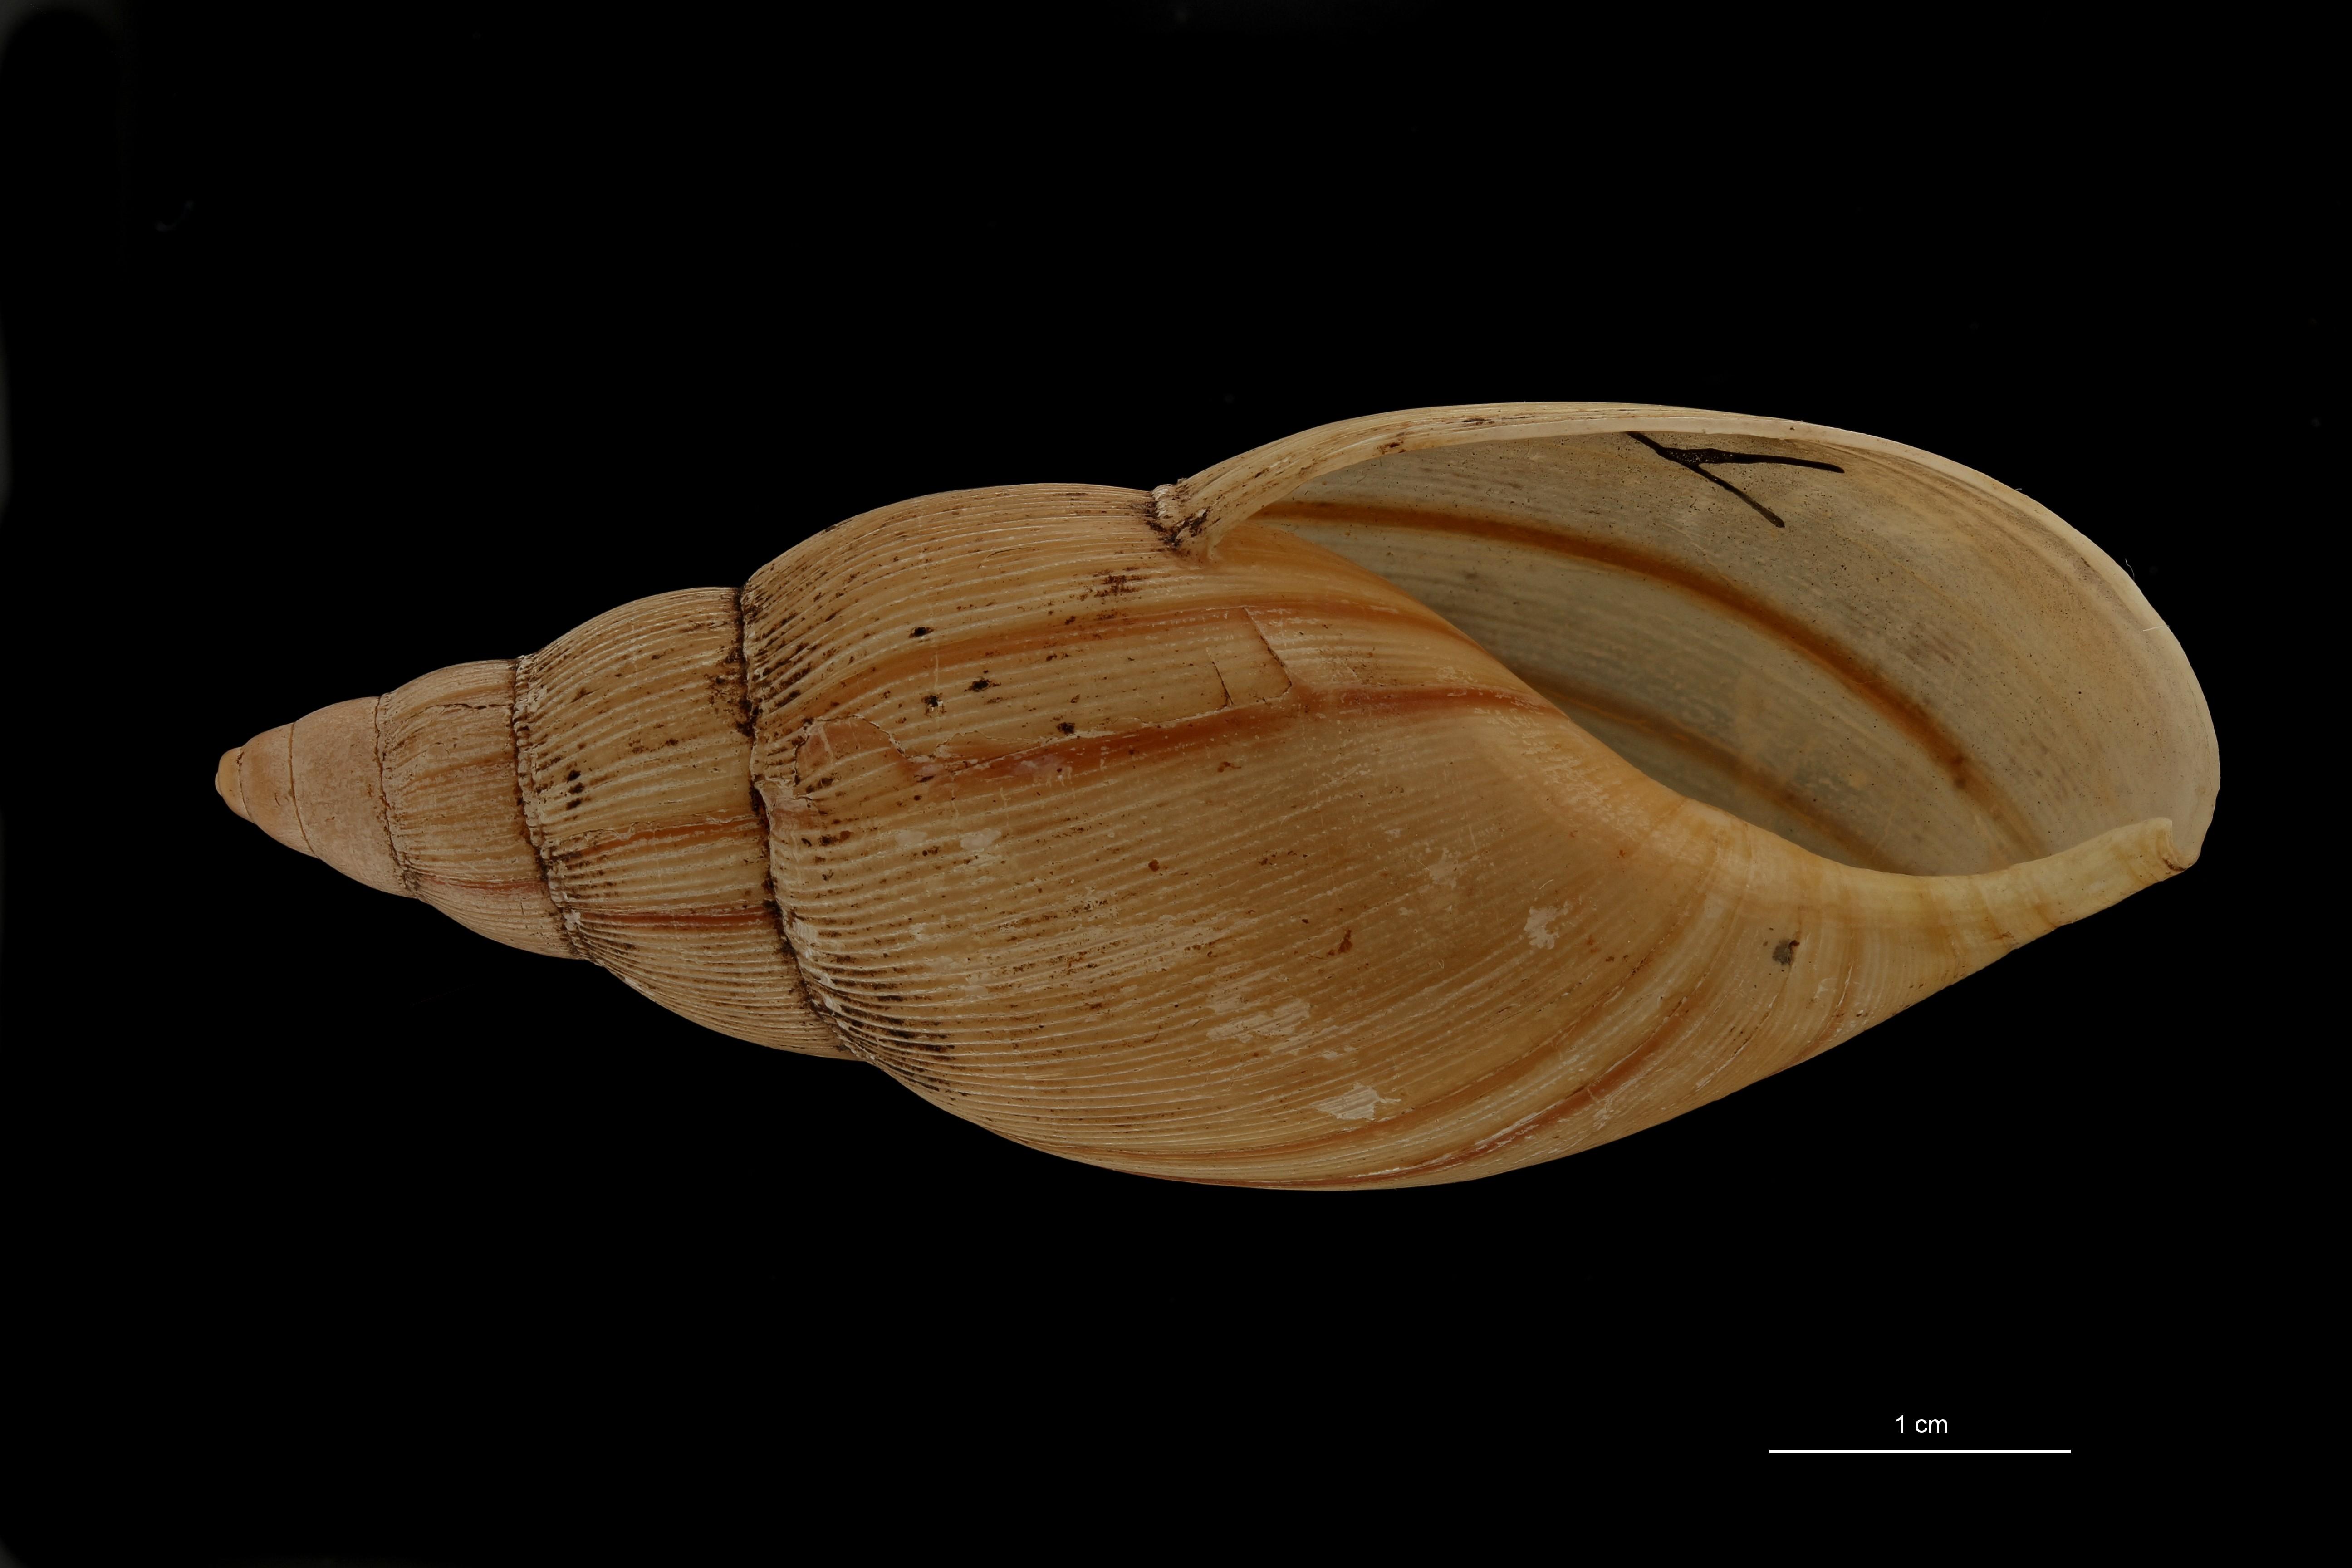 BE-RBINS-INV MT 658 Glandina ecuadoriensis Type V ZS PMax Scaled.jpg